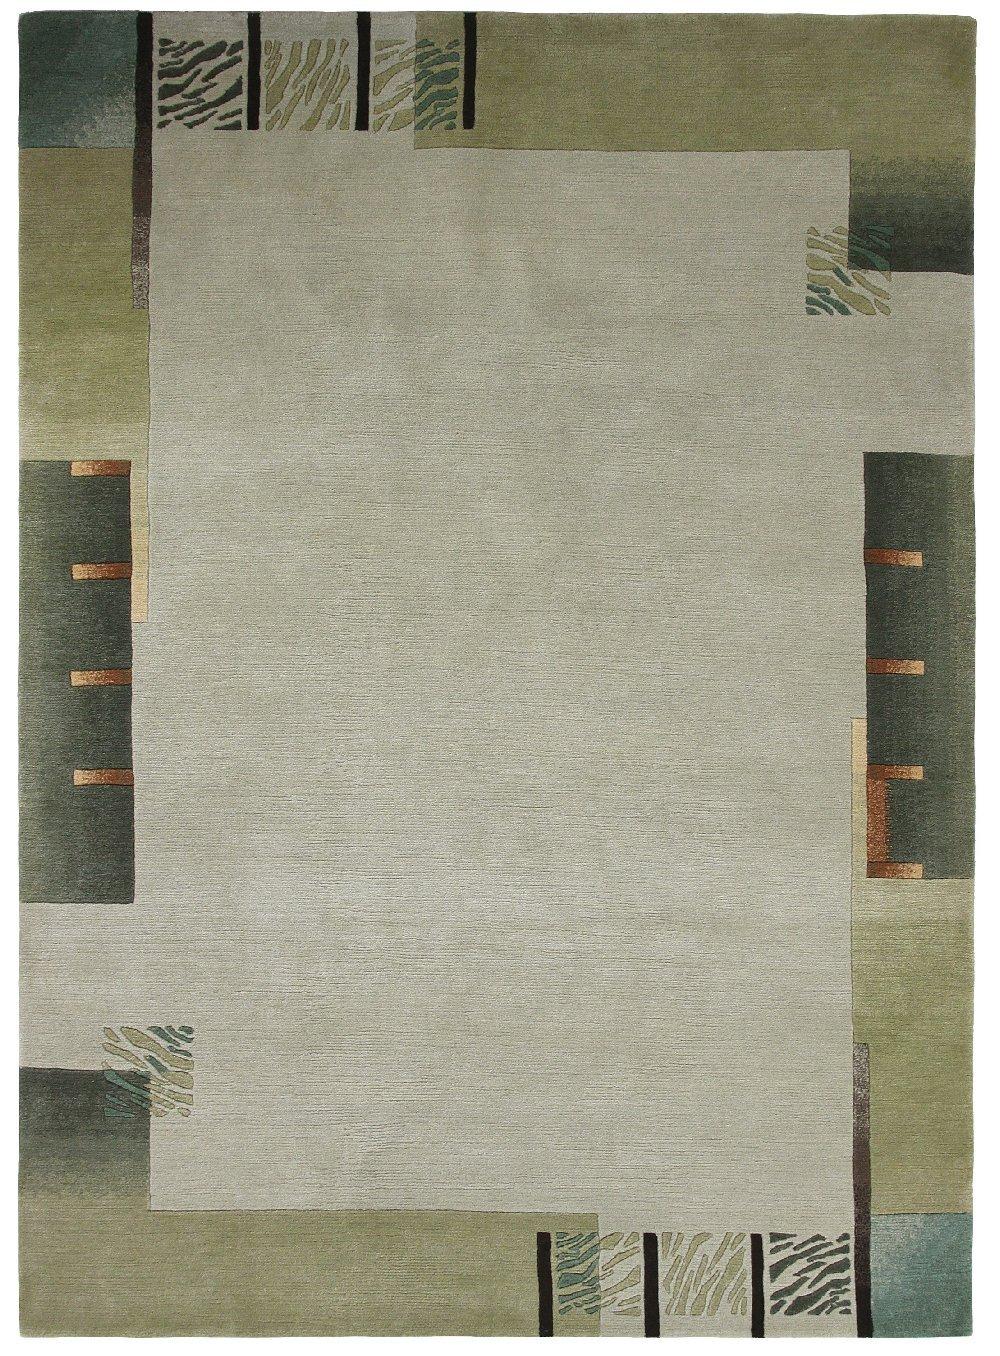 teppichwelt sona lux nepal teppich handgekn pft lind. Black Bedroom Furniture Sets. Home Design Ideas